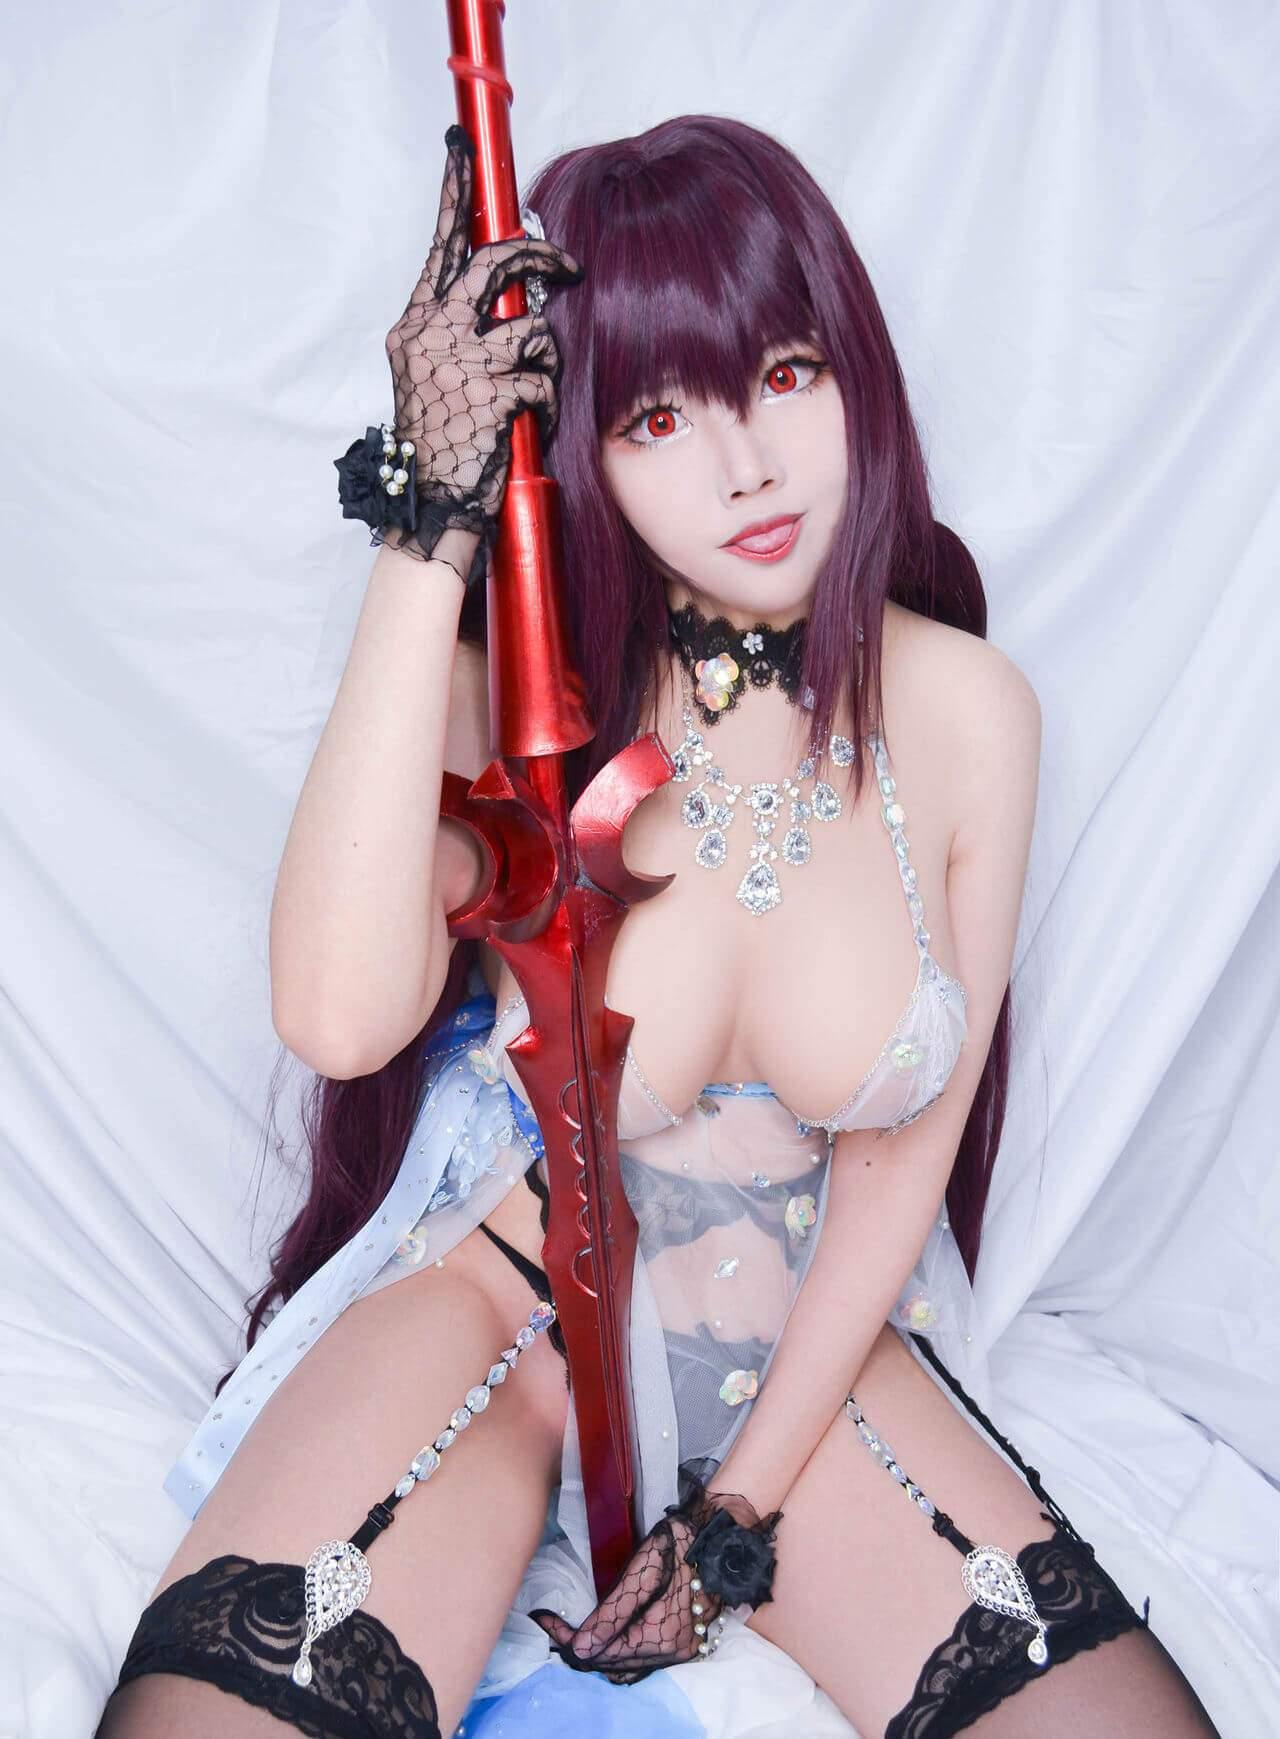 【Cosplay】[Kaya] Fate Grand Order スカサハ(ロイヤル・アイシング) COS-第2张